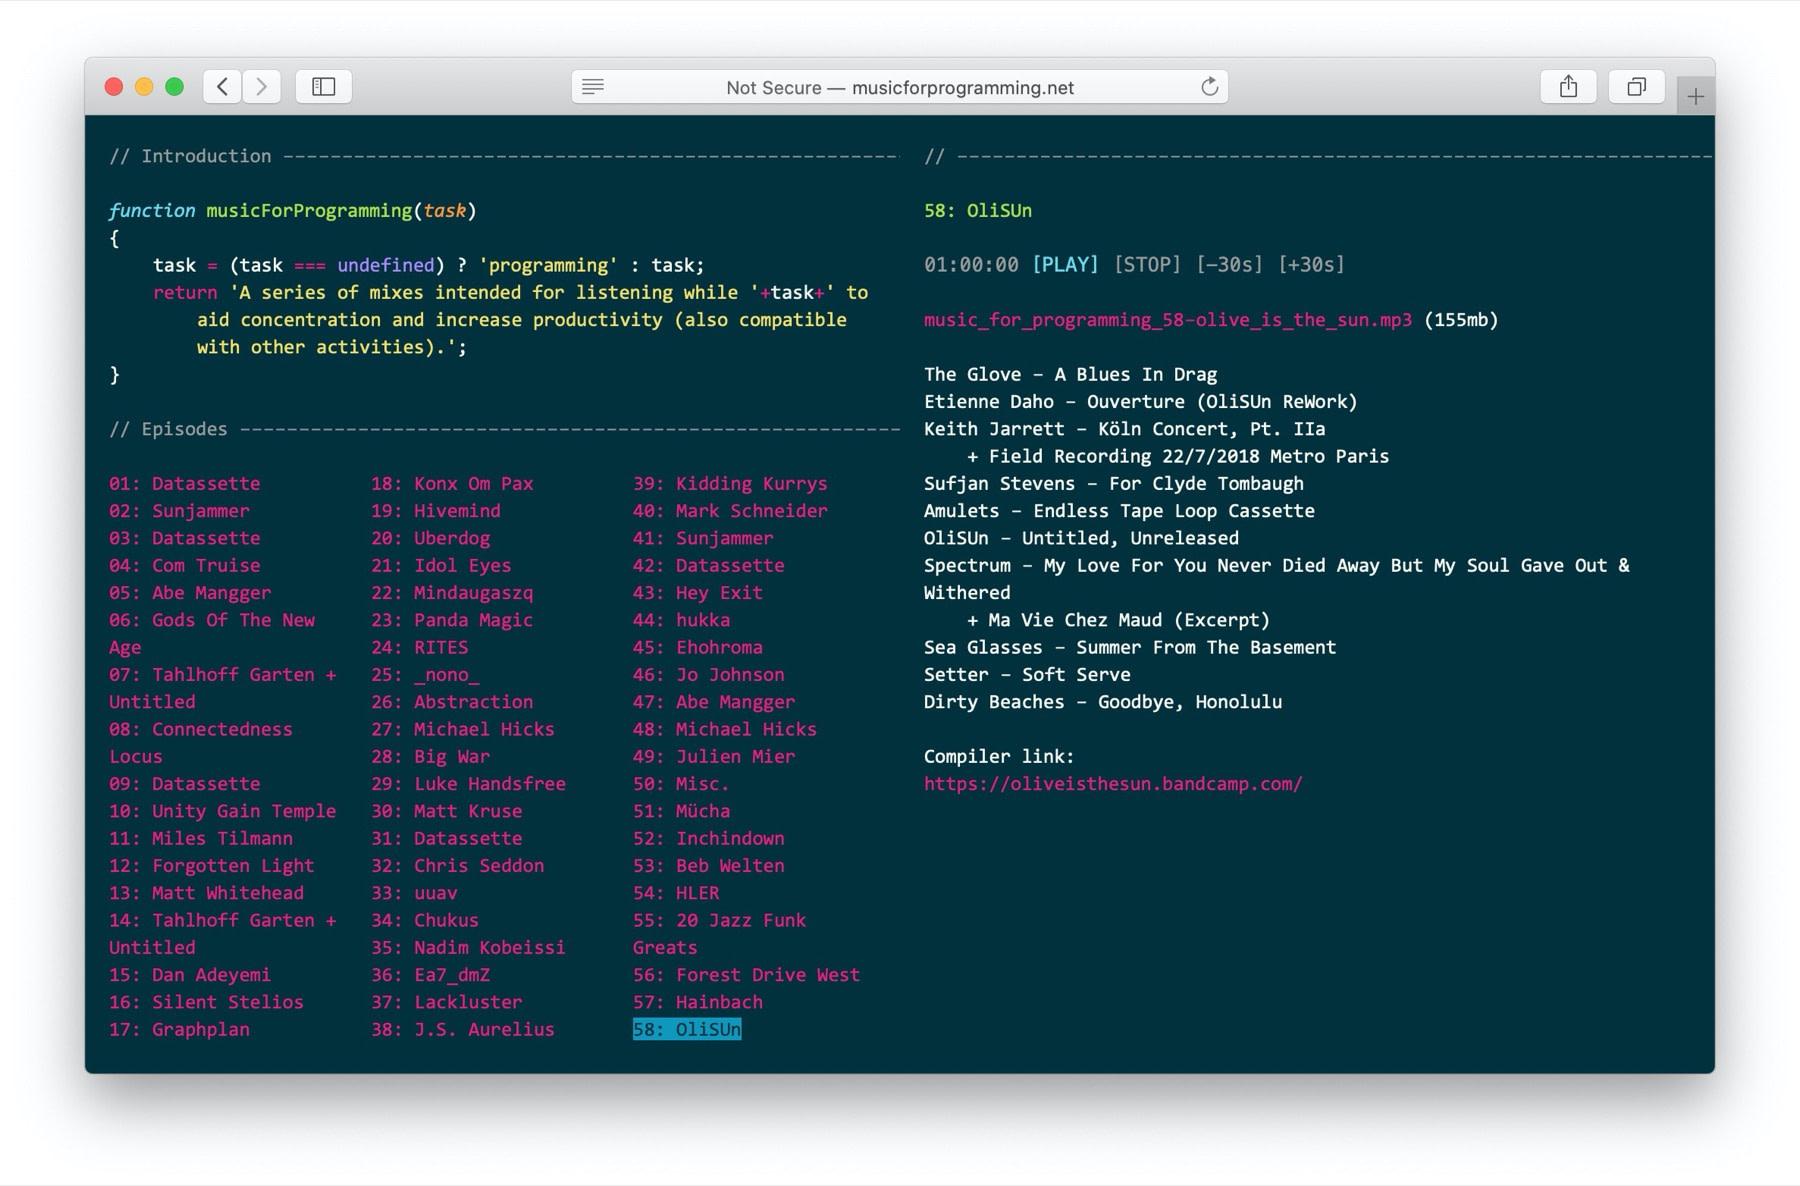 Music for Programming